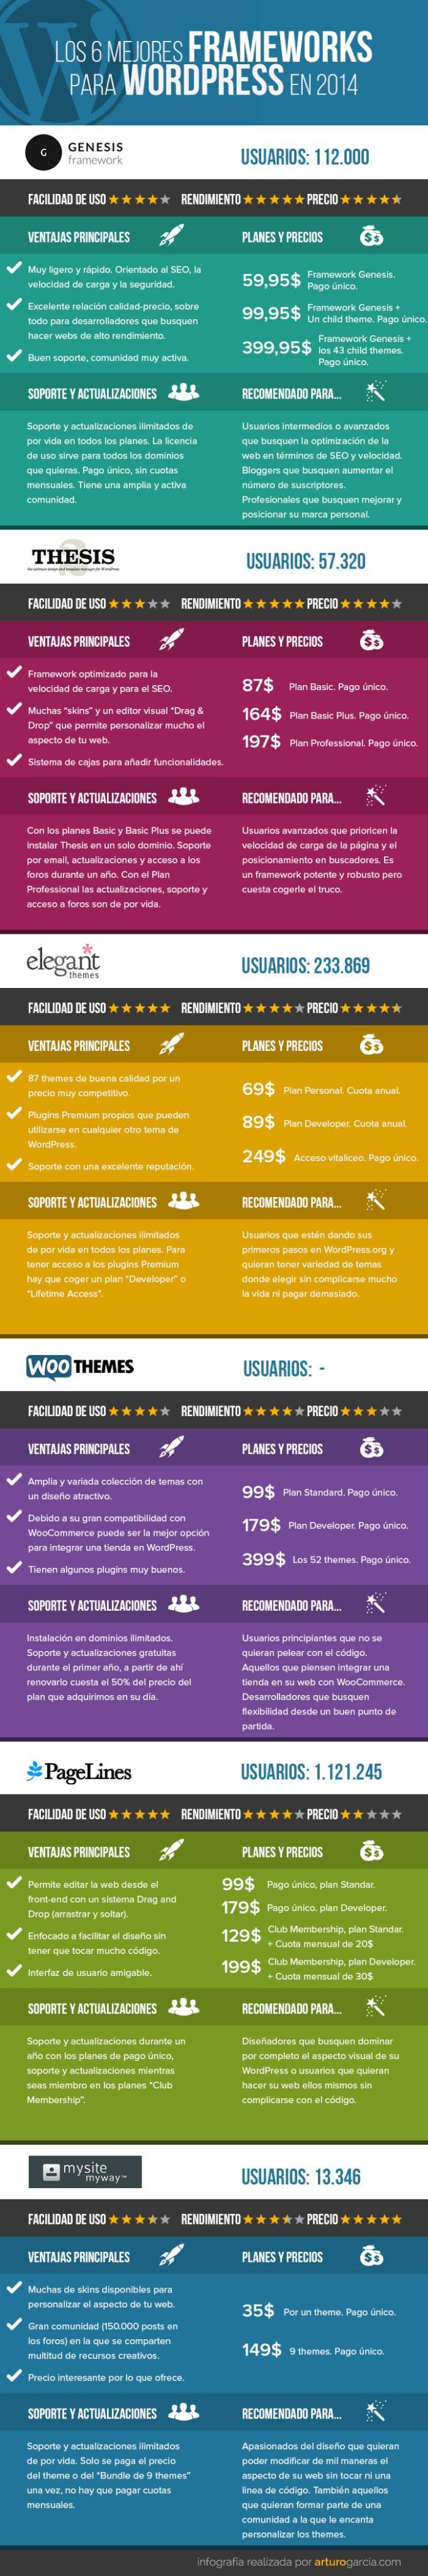 5-mejores-frameworks-para-wordpress